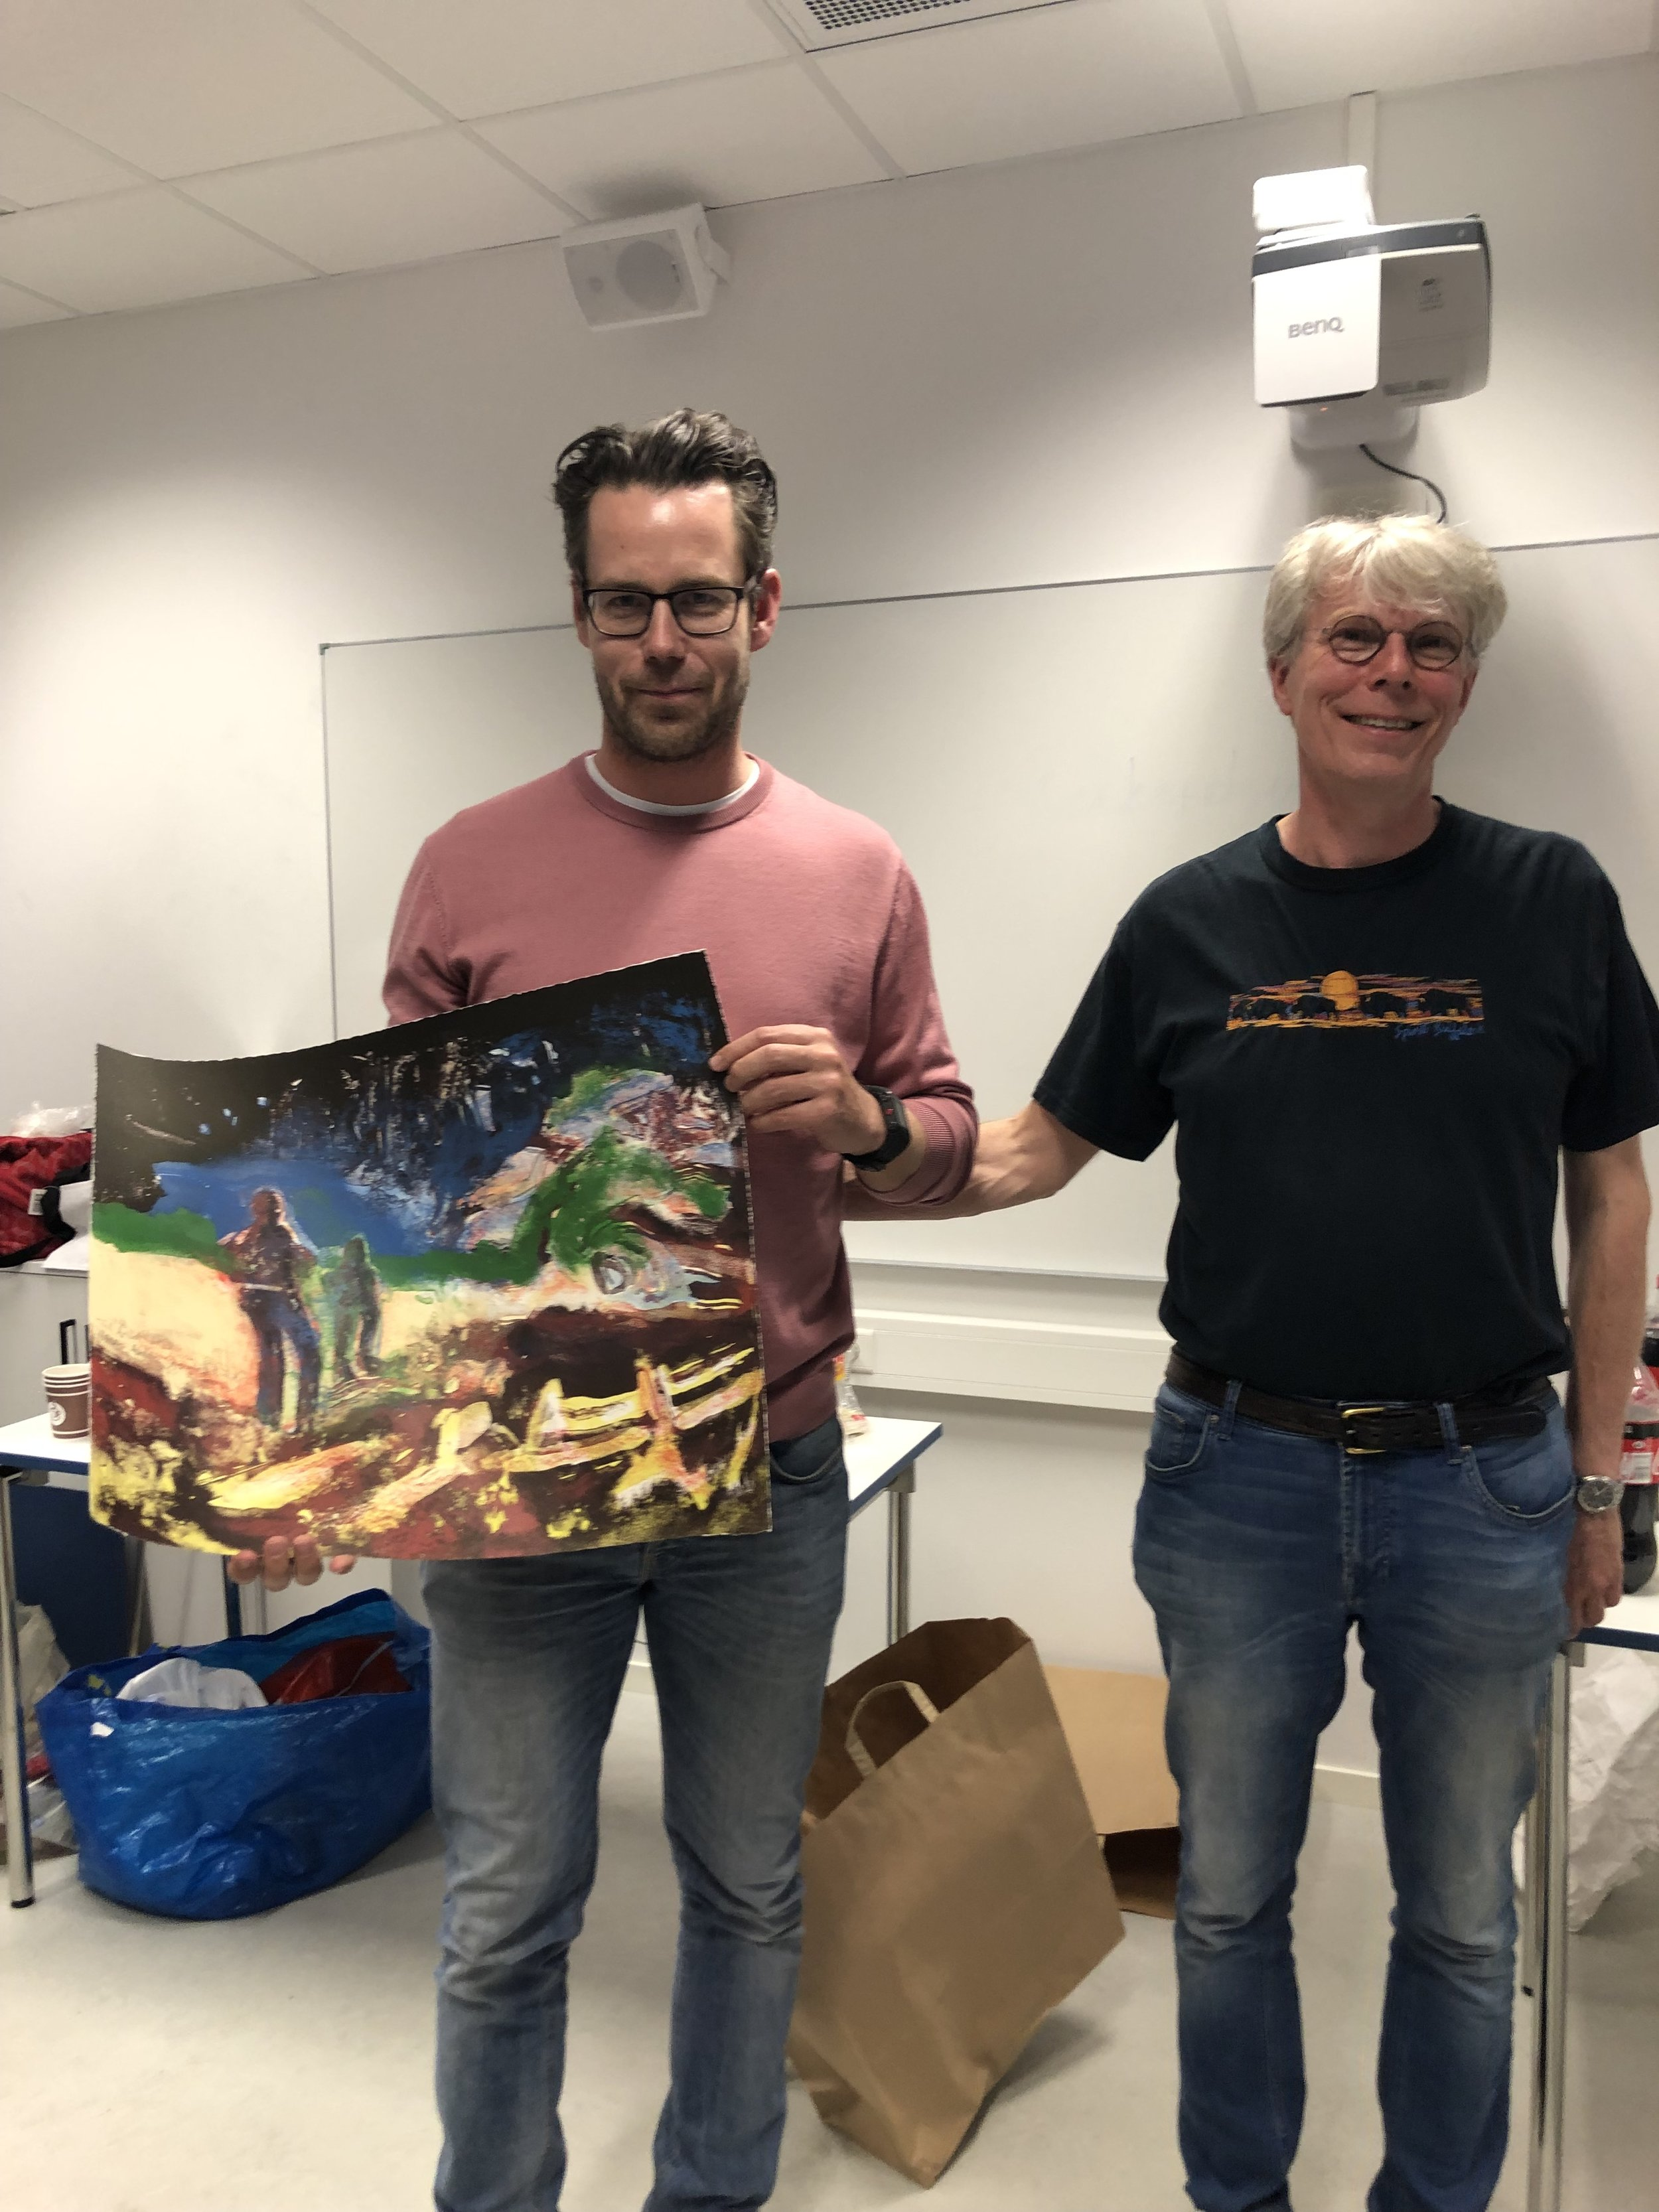 Arild Nebb Ervik og Snorre Kverndokk